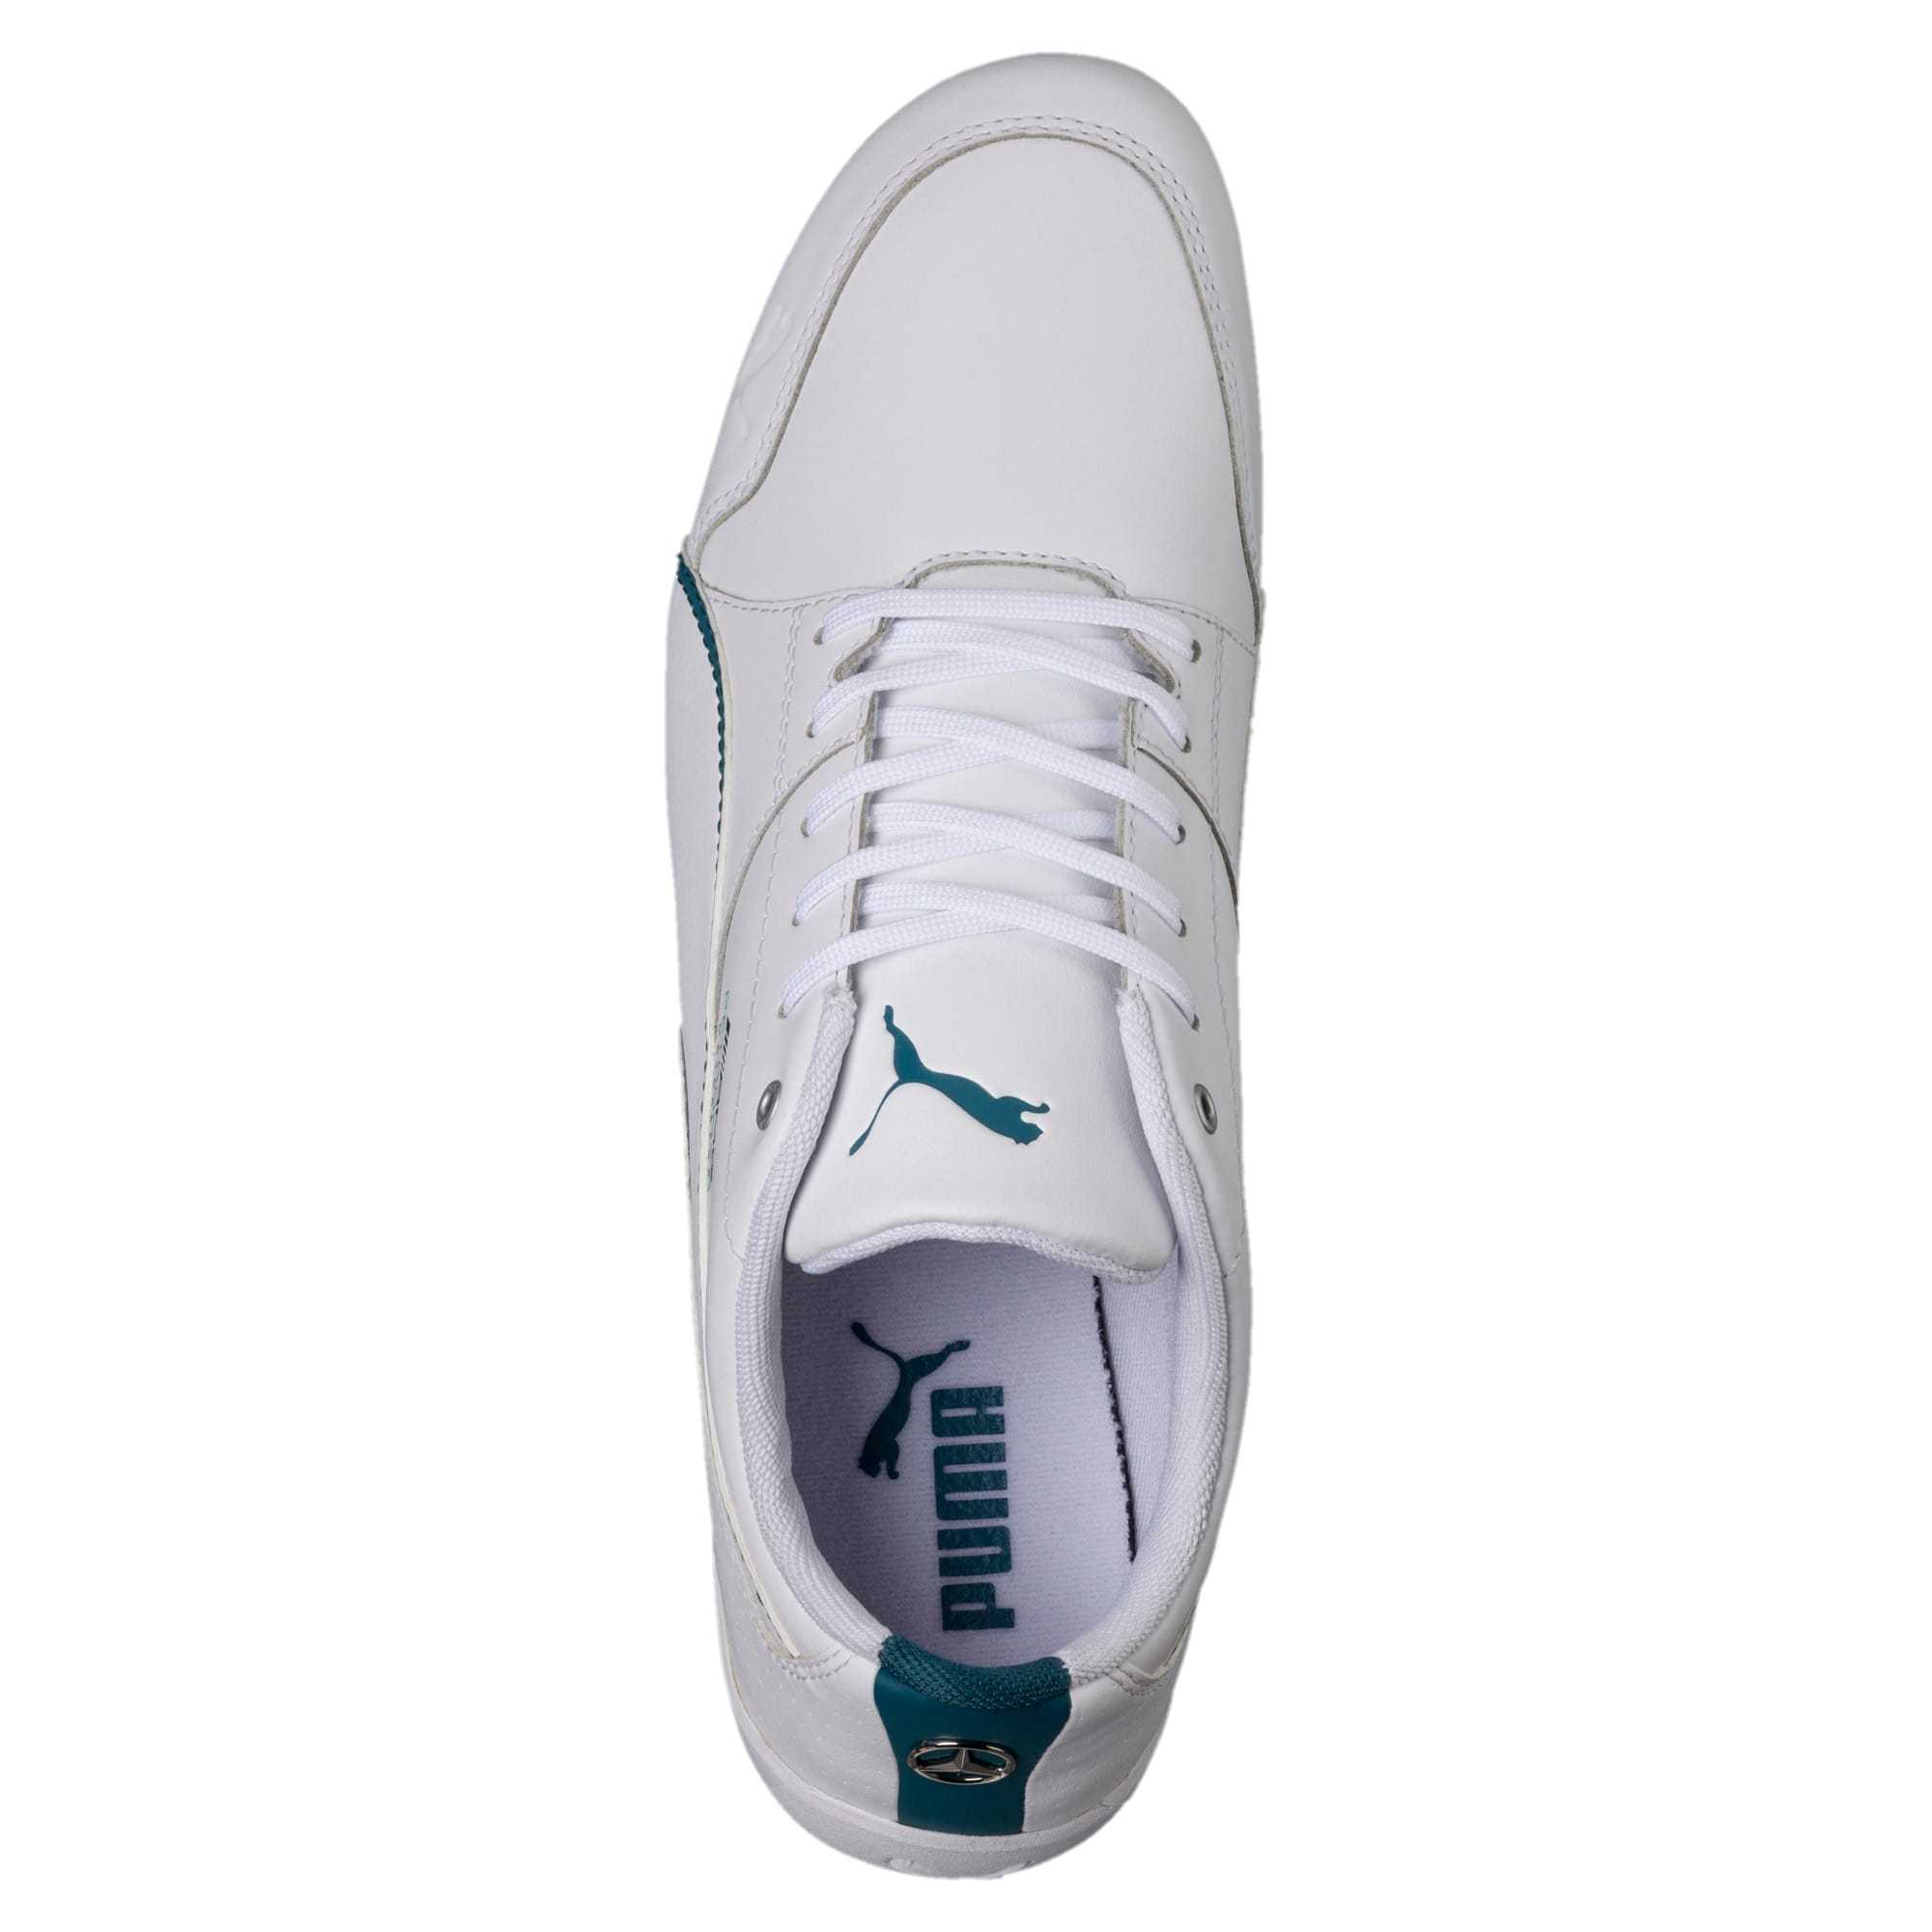 Thumbnail 5 of Mercedes AMG Petronas Motorsport Drift Cat 7 Shoes, Puma White-Puma White, medium